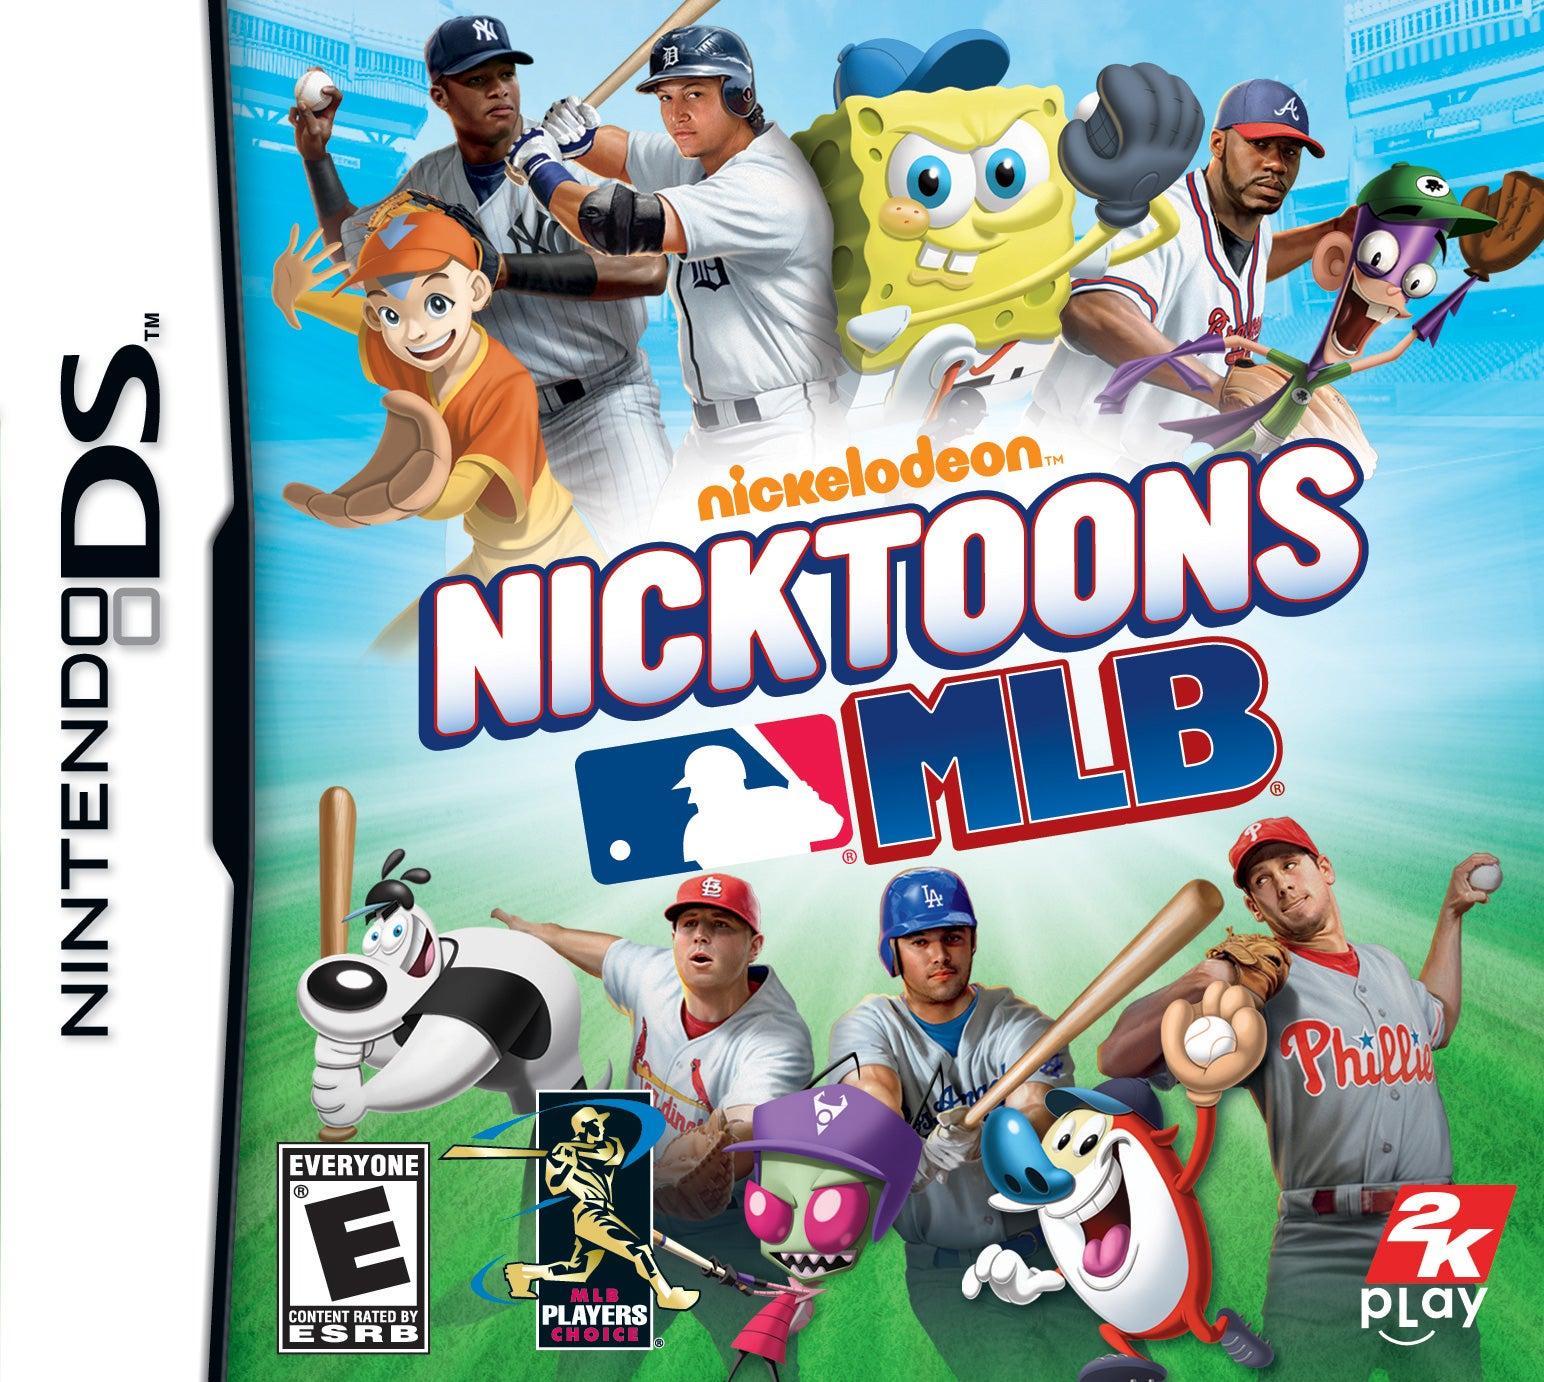 Nicktoons MLB Nintendo DS IGN